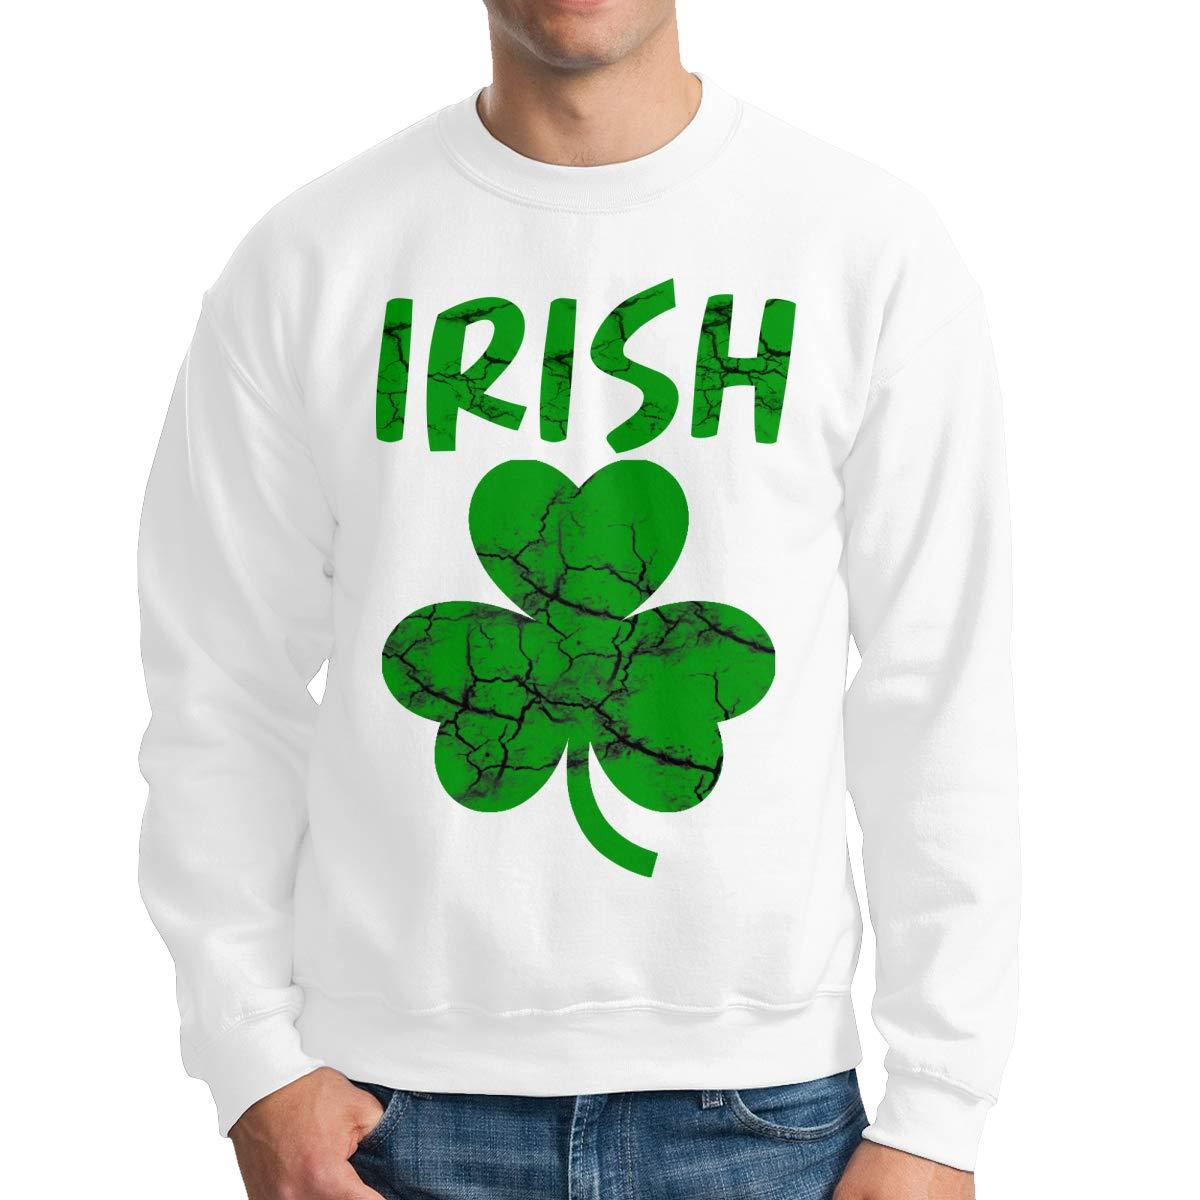 Irish Novelty St Patricks Day Adult S Casual Hoody T Shirts